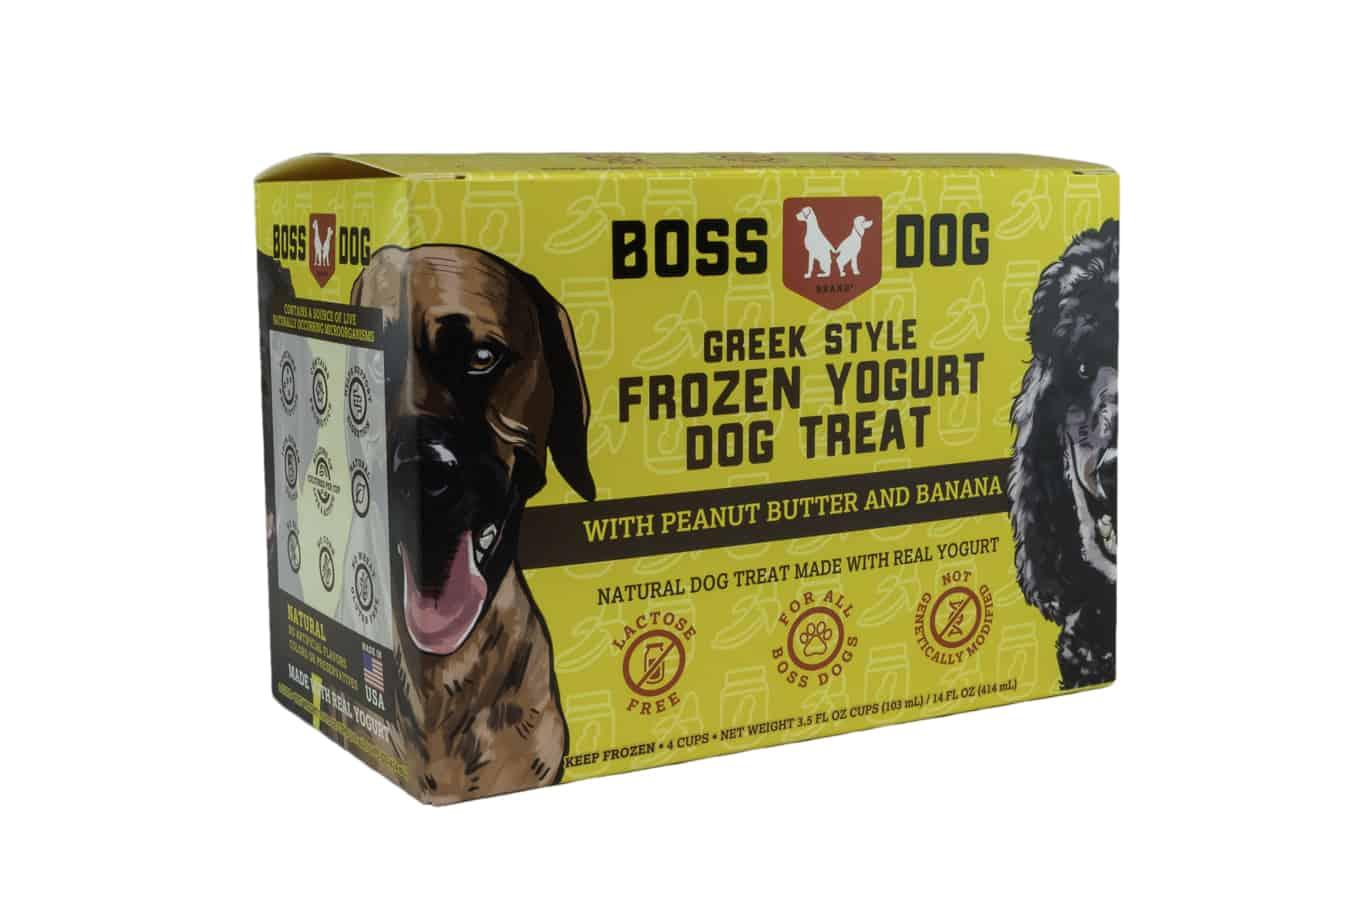 Boss Dog PB & Banana Frozen Yogurt Dog Treat